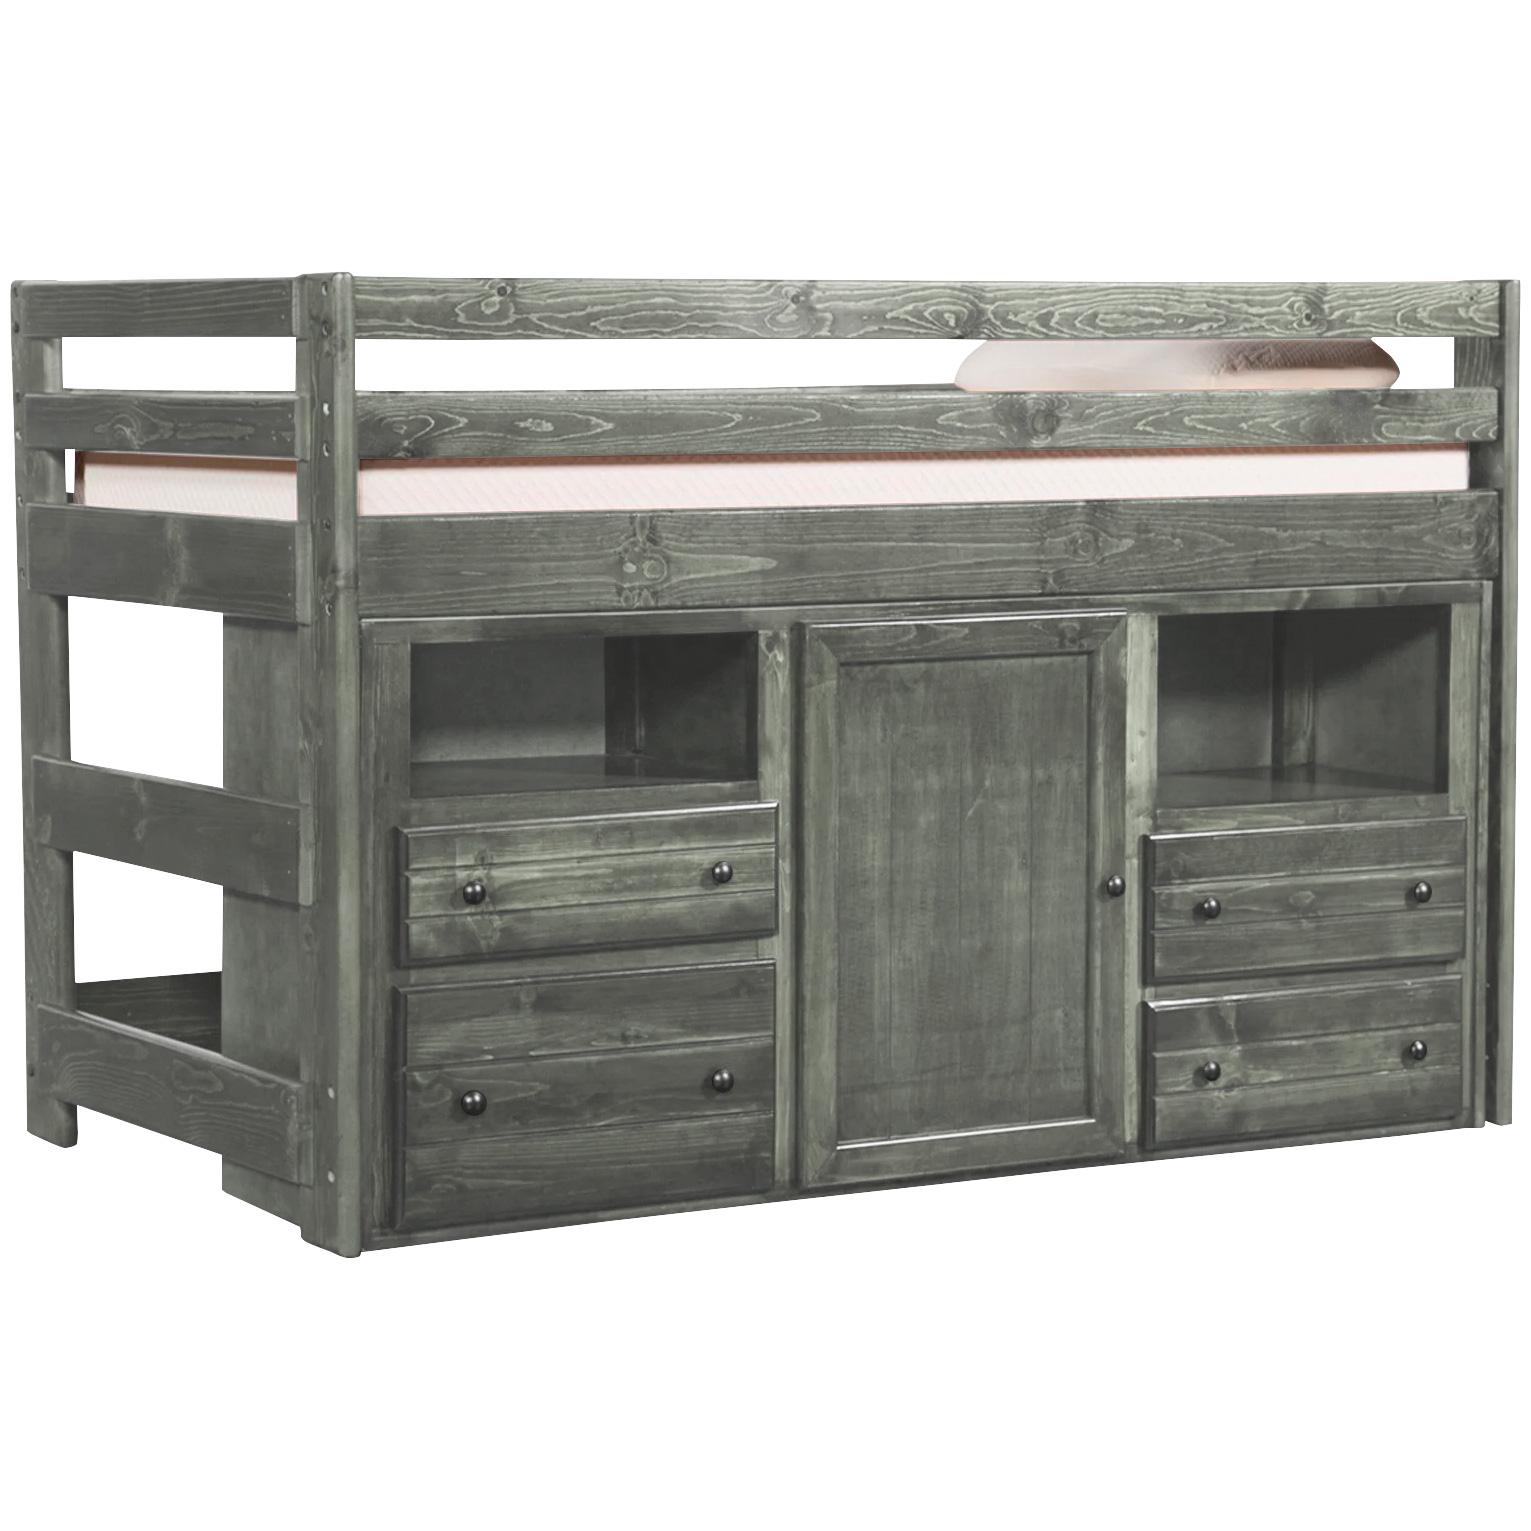 Trendwood Inc. | Bayview Driftwood Loft Bed with Super Dresser